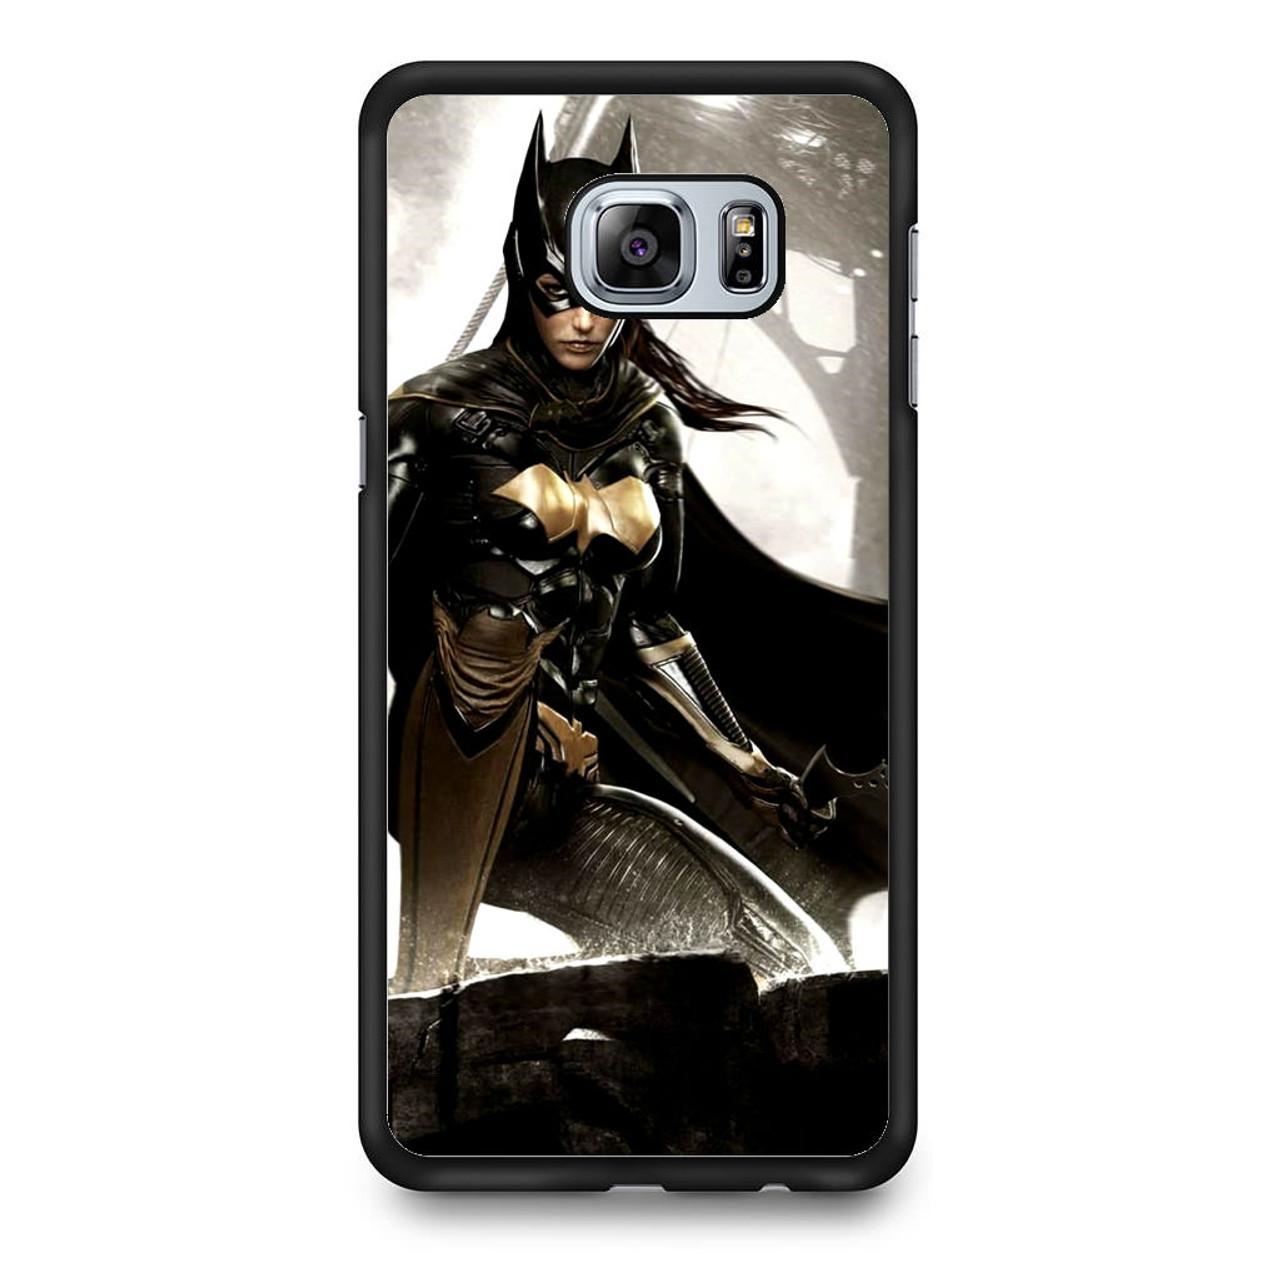 innovative design 9859c eae0a Batgirl Batman Arkham Knight Samsung Galaxy S6 Edge Plus Case